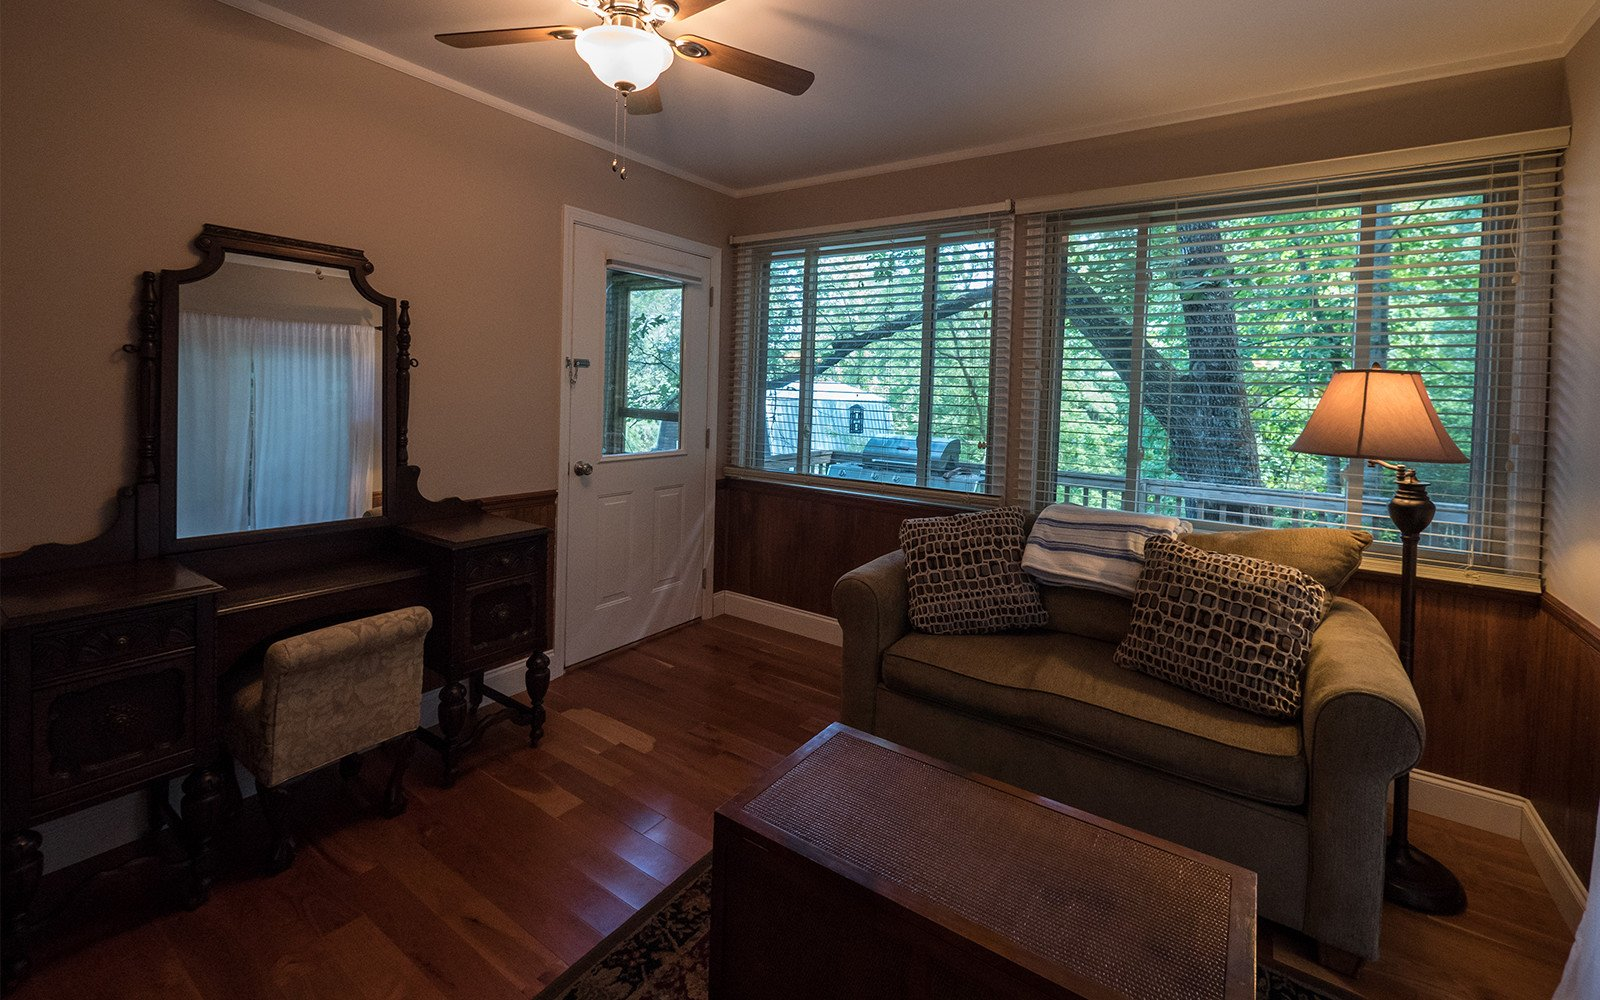 Sunporch-Master-Bedroom-Hilt-St-house